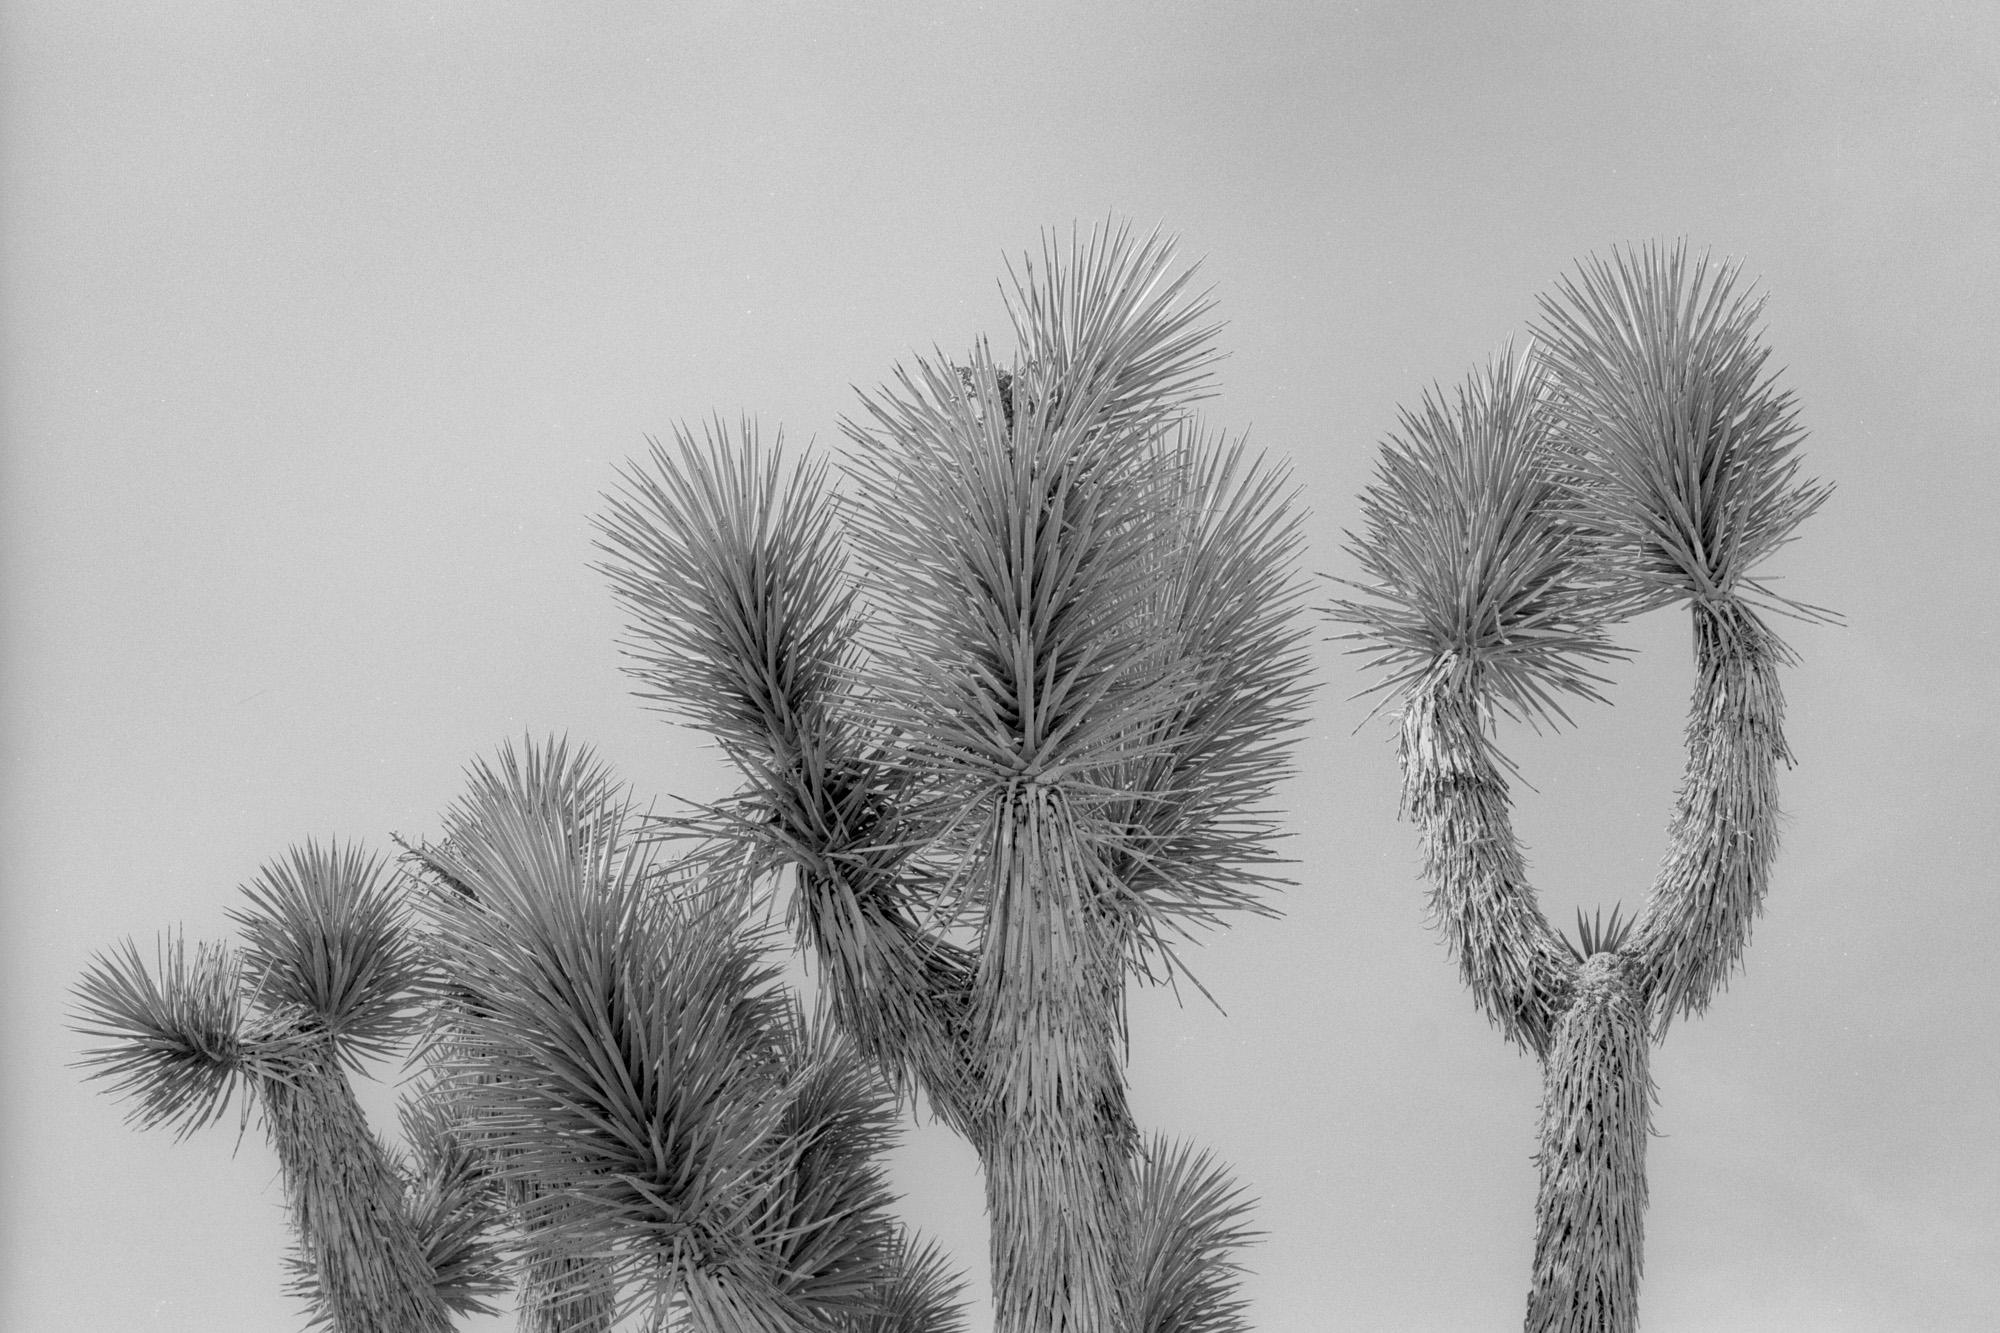 35mm-16.jpg